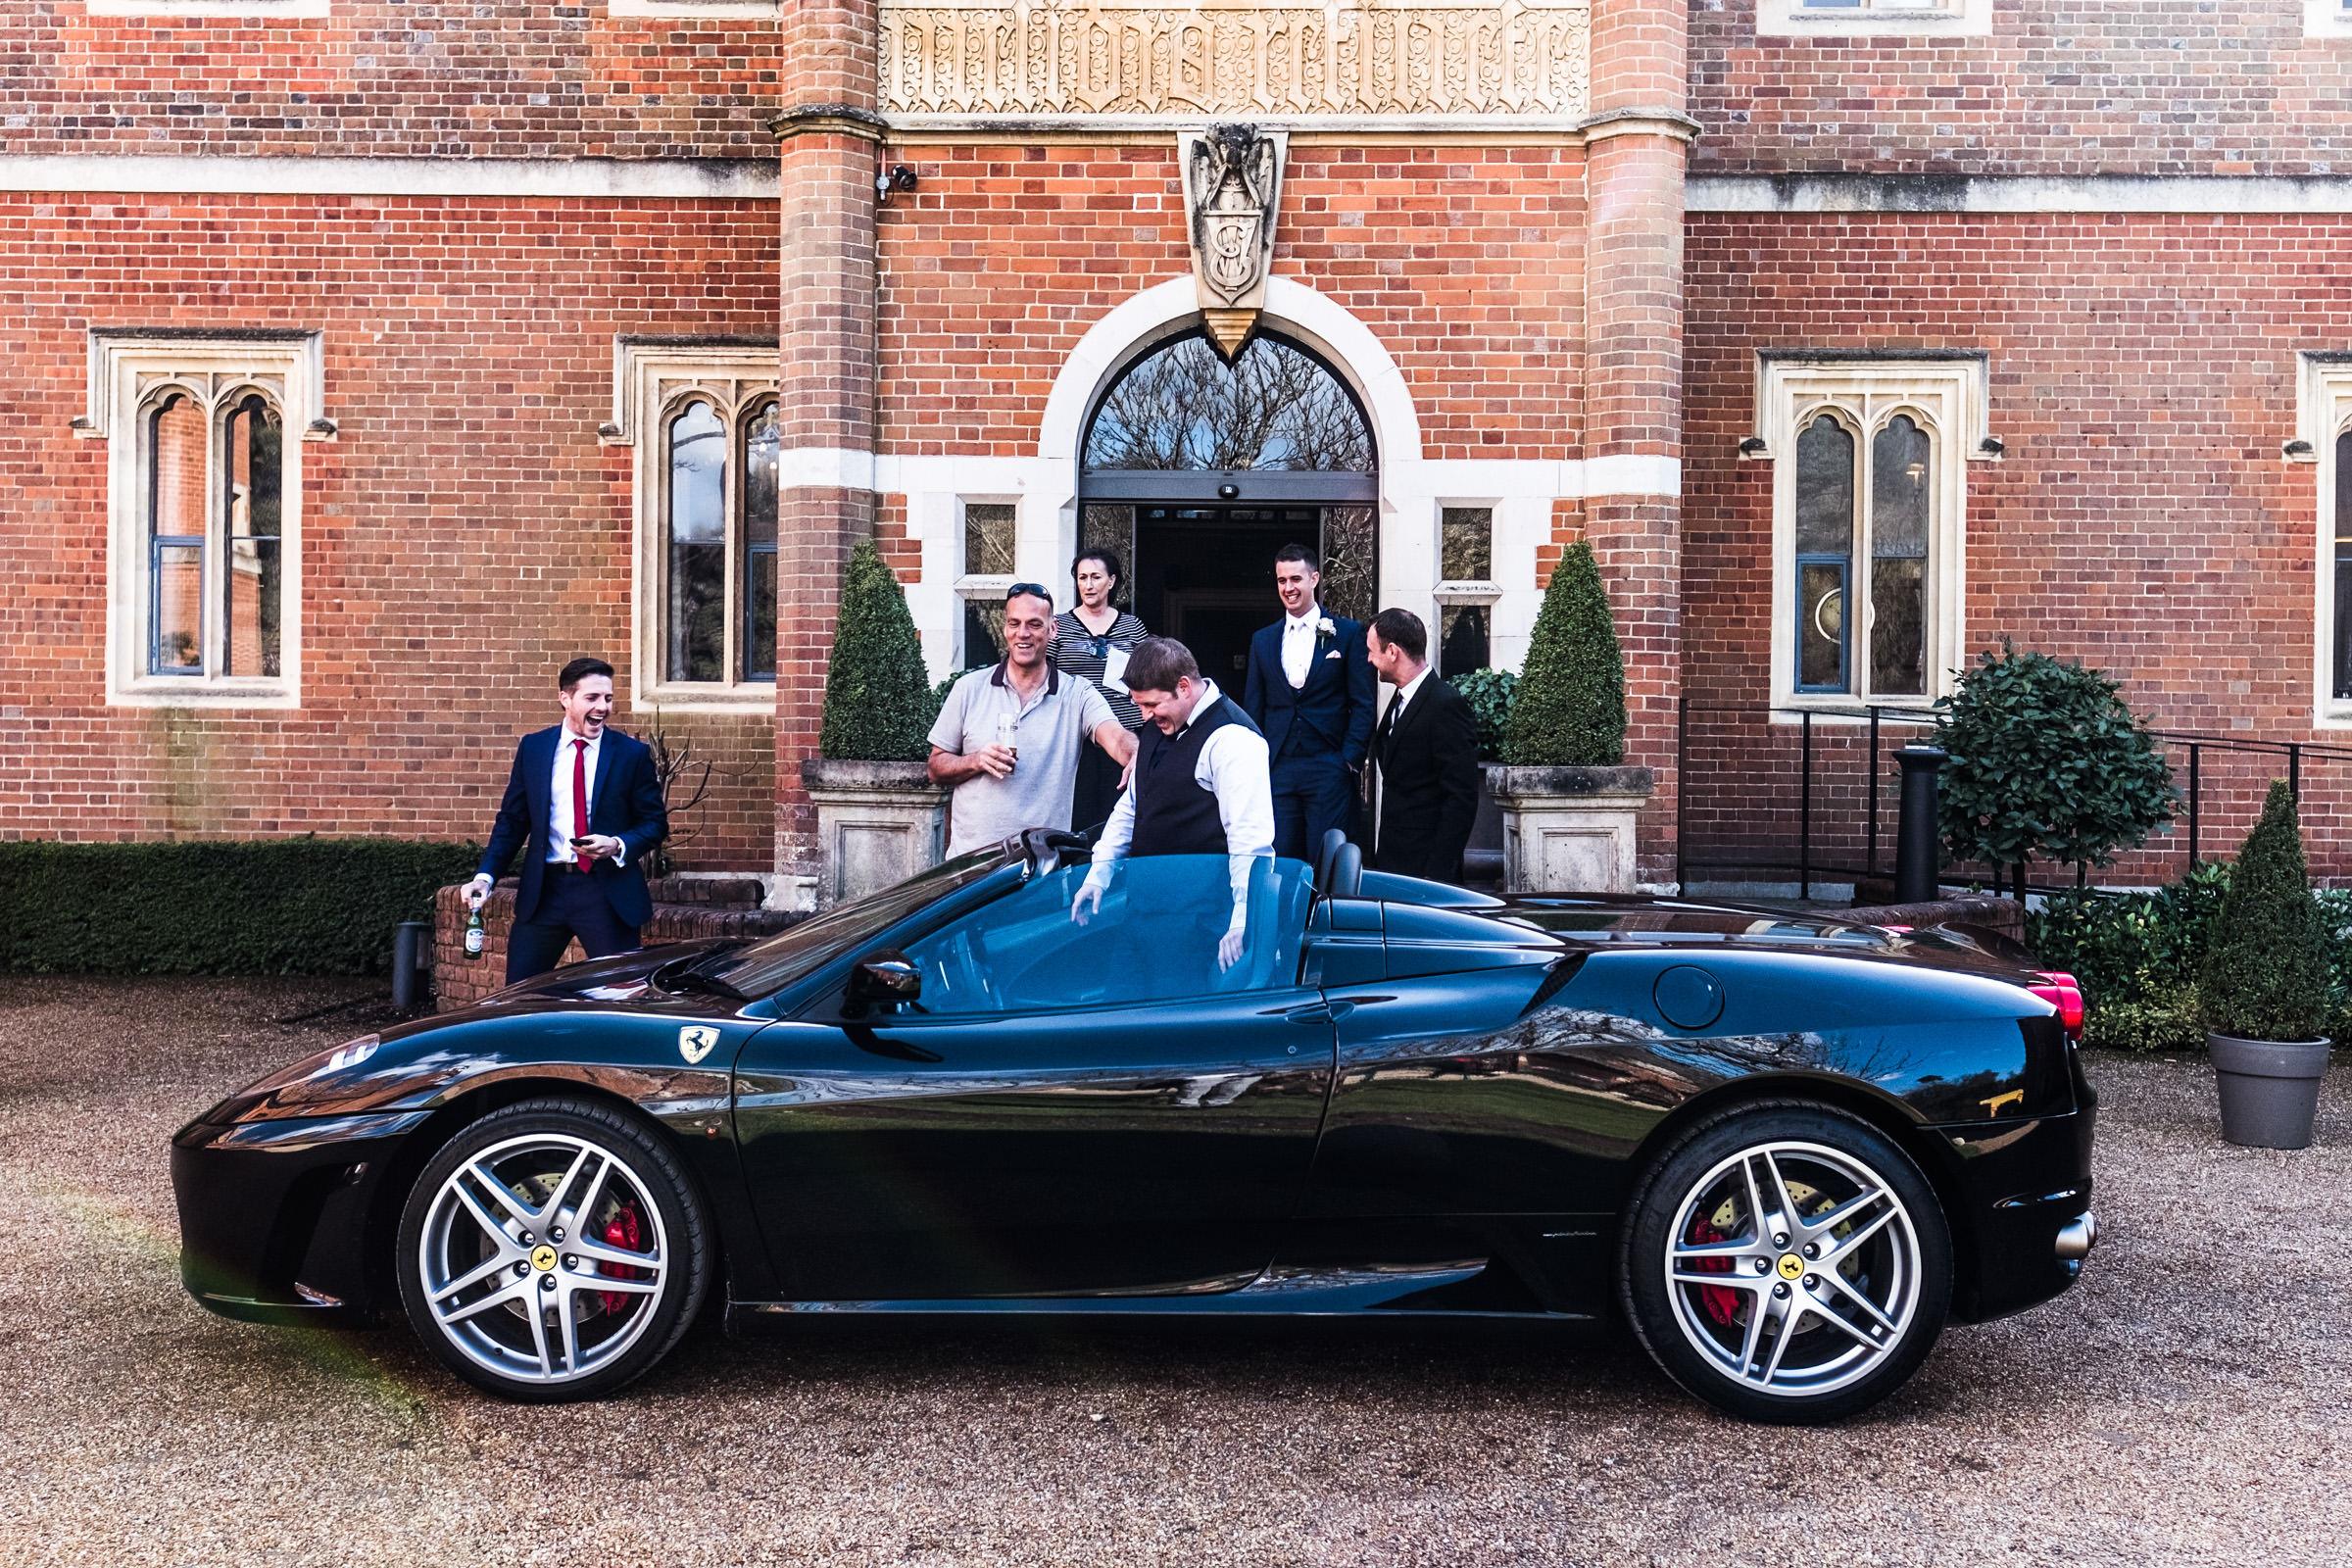 Donna & Nick's Wedding at Wotton House in Dorking 004.jpg